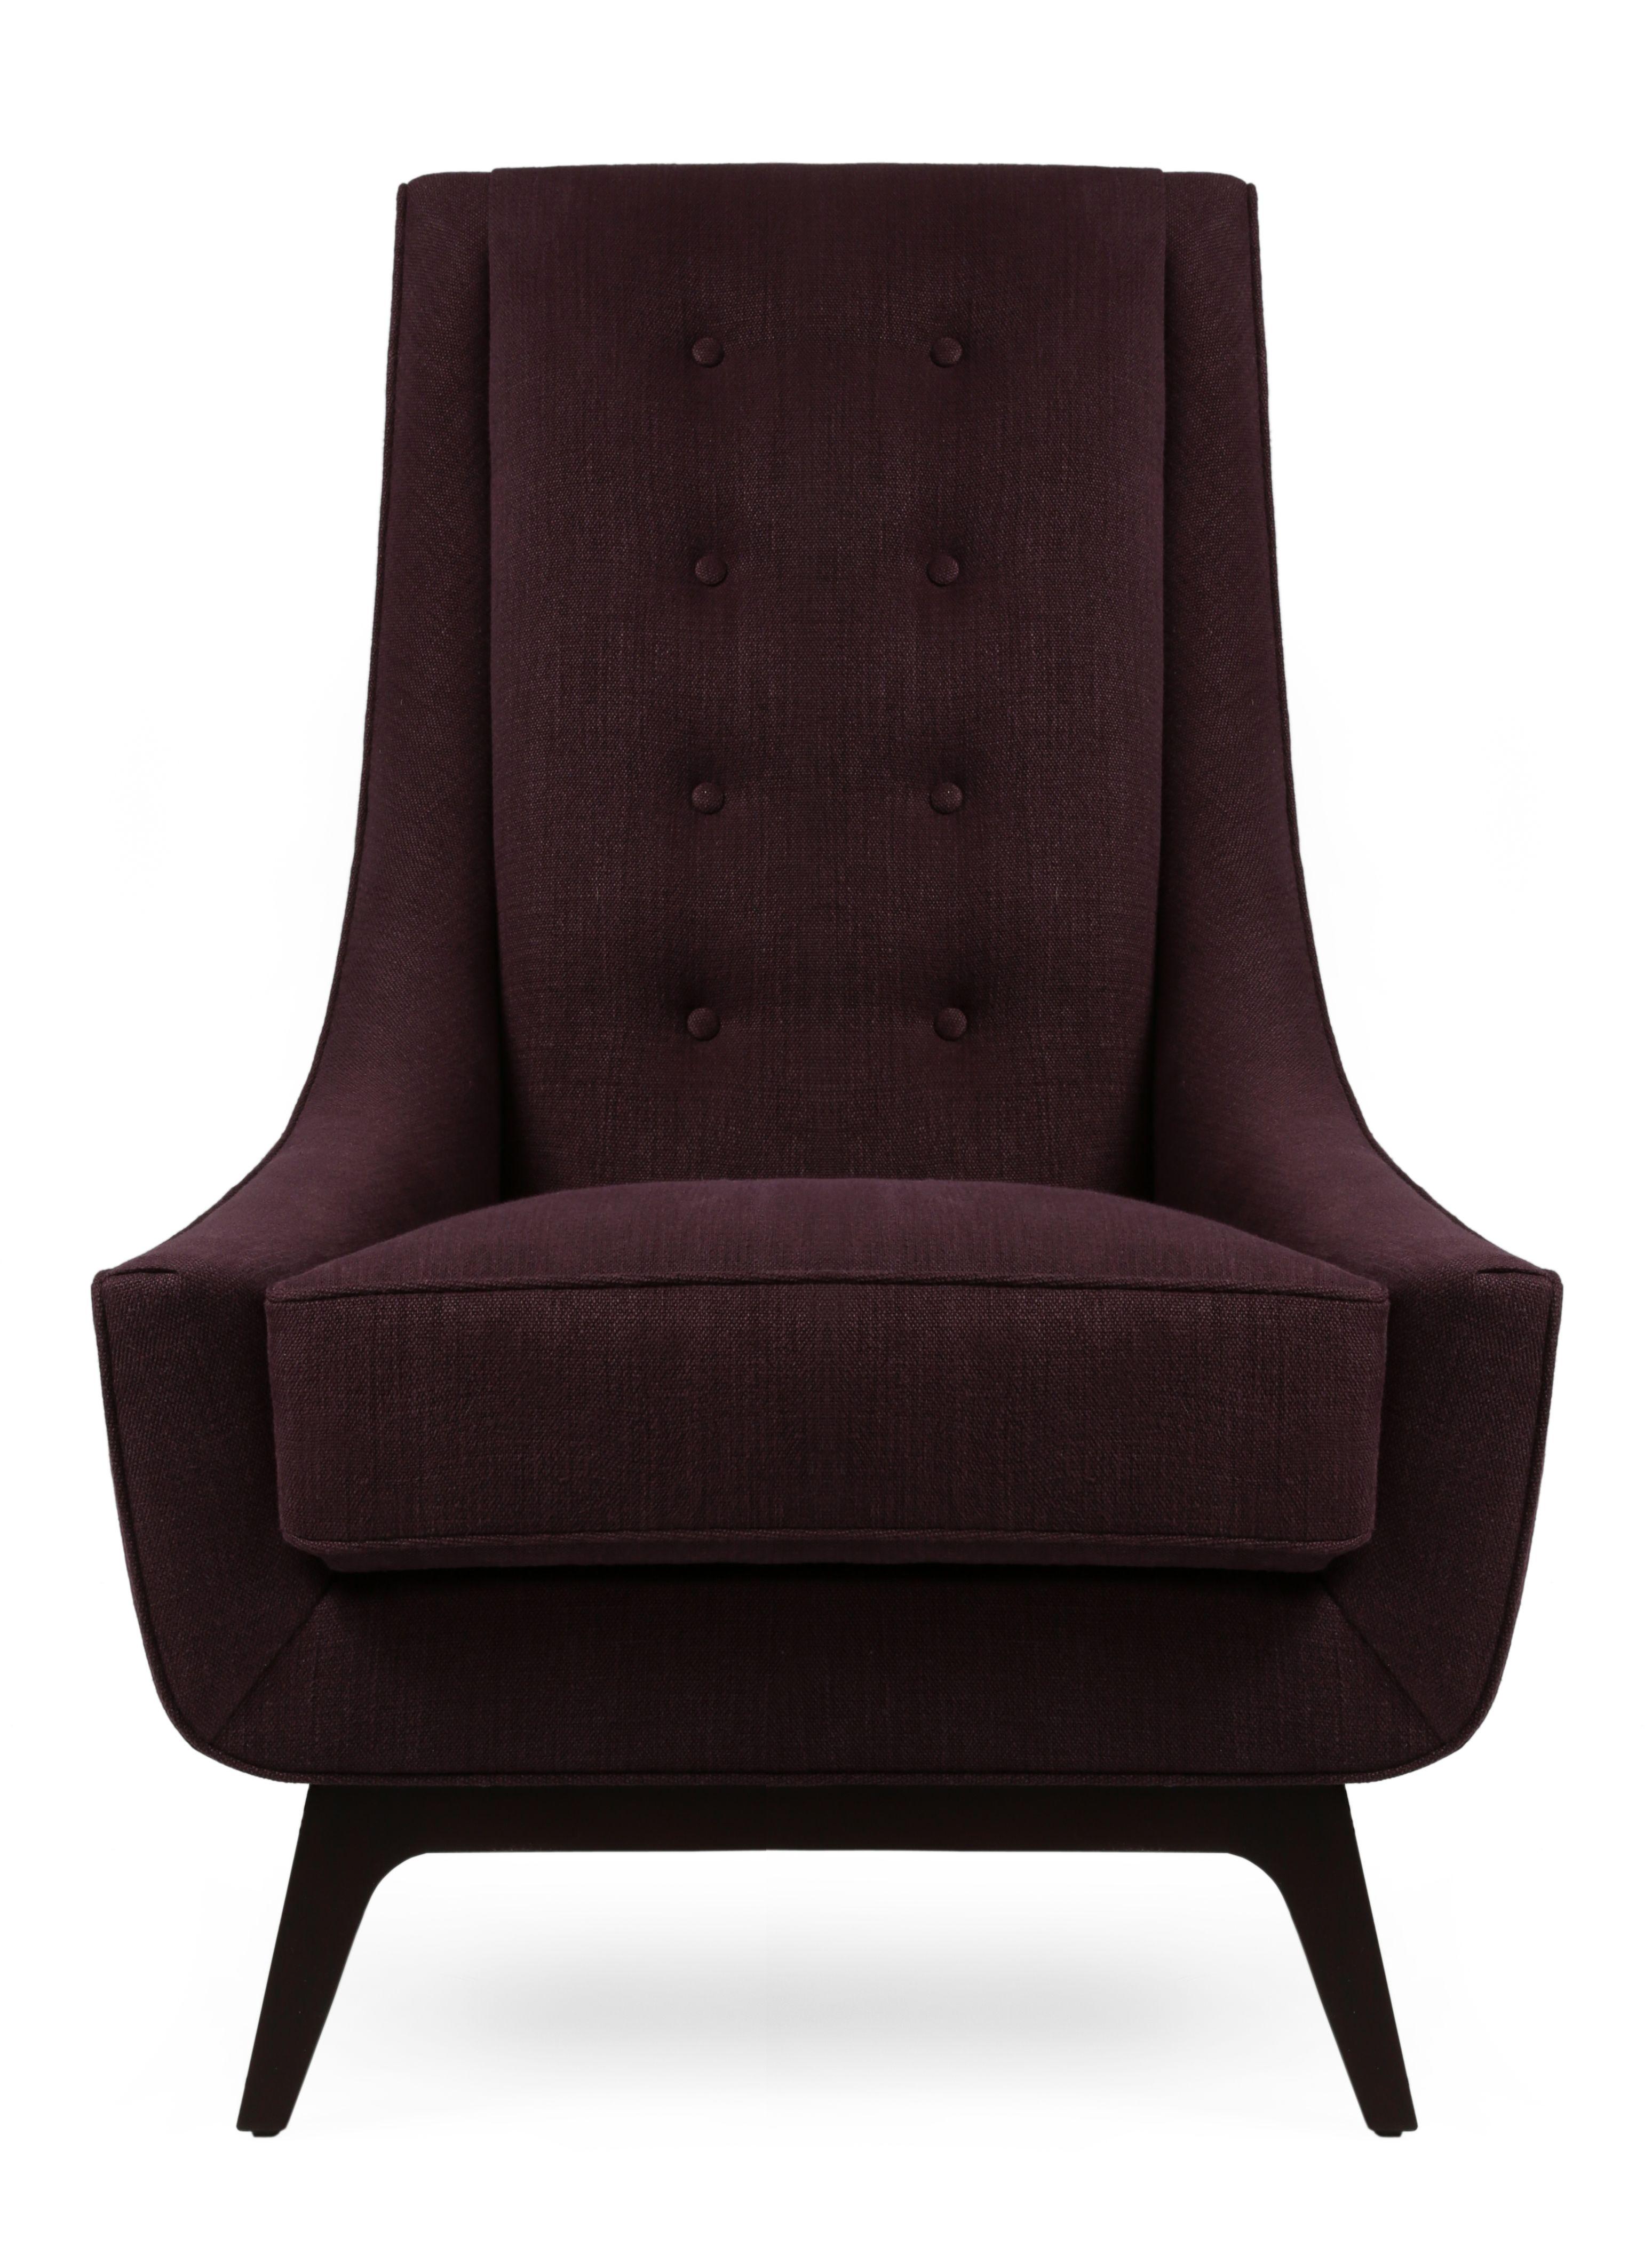 Pleasing Bespoke Occasional Chairs The Sofa Chair Company Inzonedesignstudio Interior Chair Design Inzonedesignstudiocom